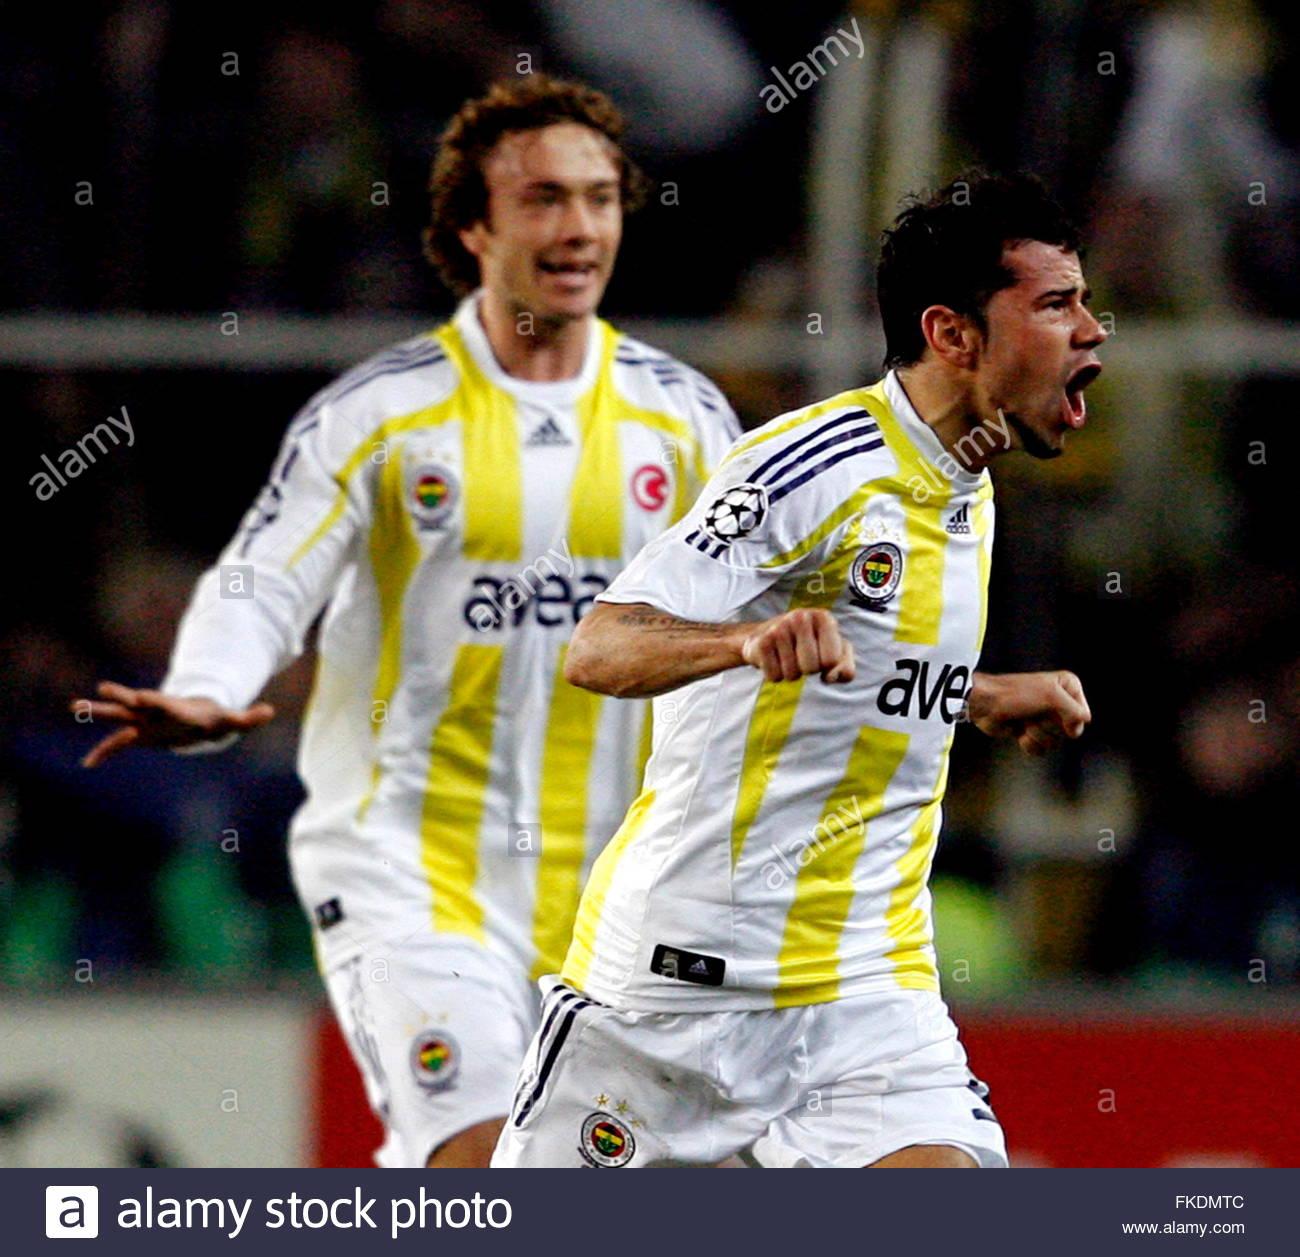 http://c8.alamy.com/comp/FKDMTC/fenerbahces-mateja-kezman-r-celebrates-his-goal-during-the-uefa-champions-FKDMTC.jpg